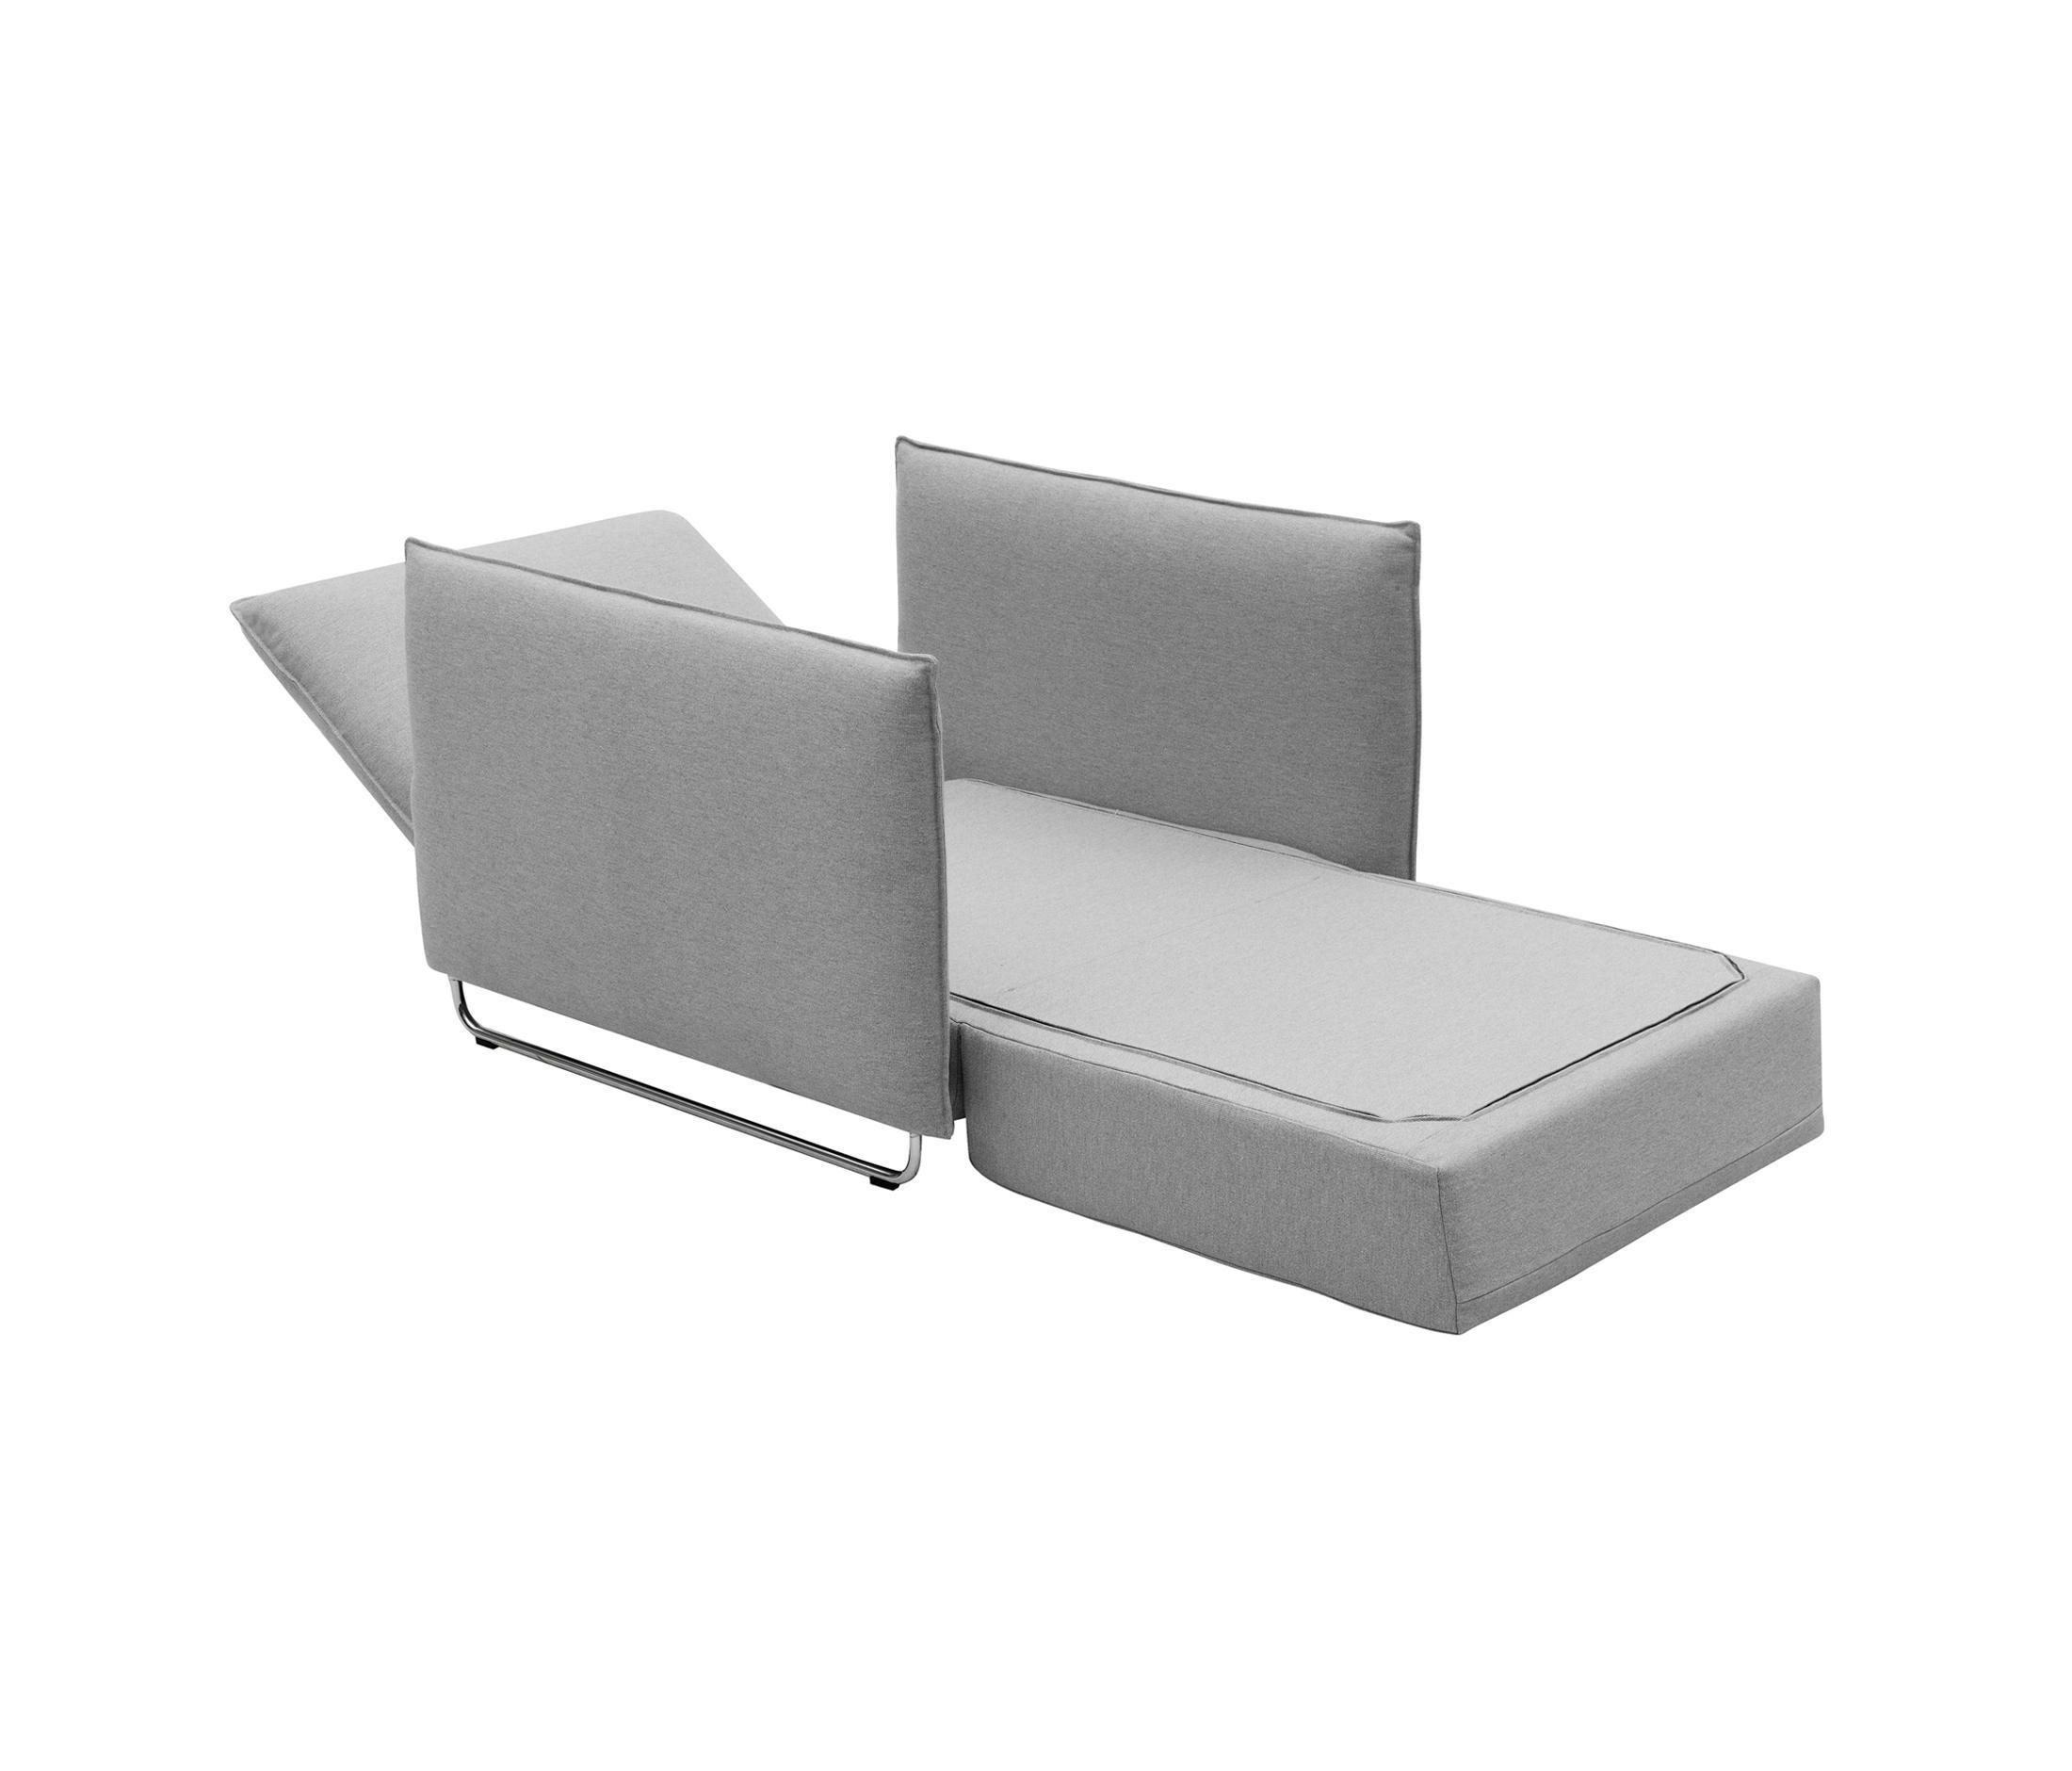 Https Www Architonic Com De Product Softline A S Cord Sessel 1155842 Bettsofa Kleine Sessel